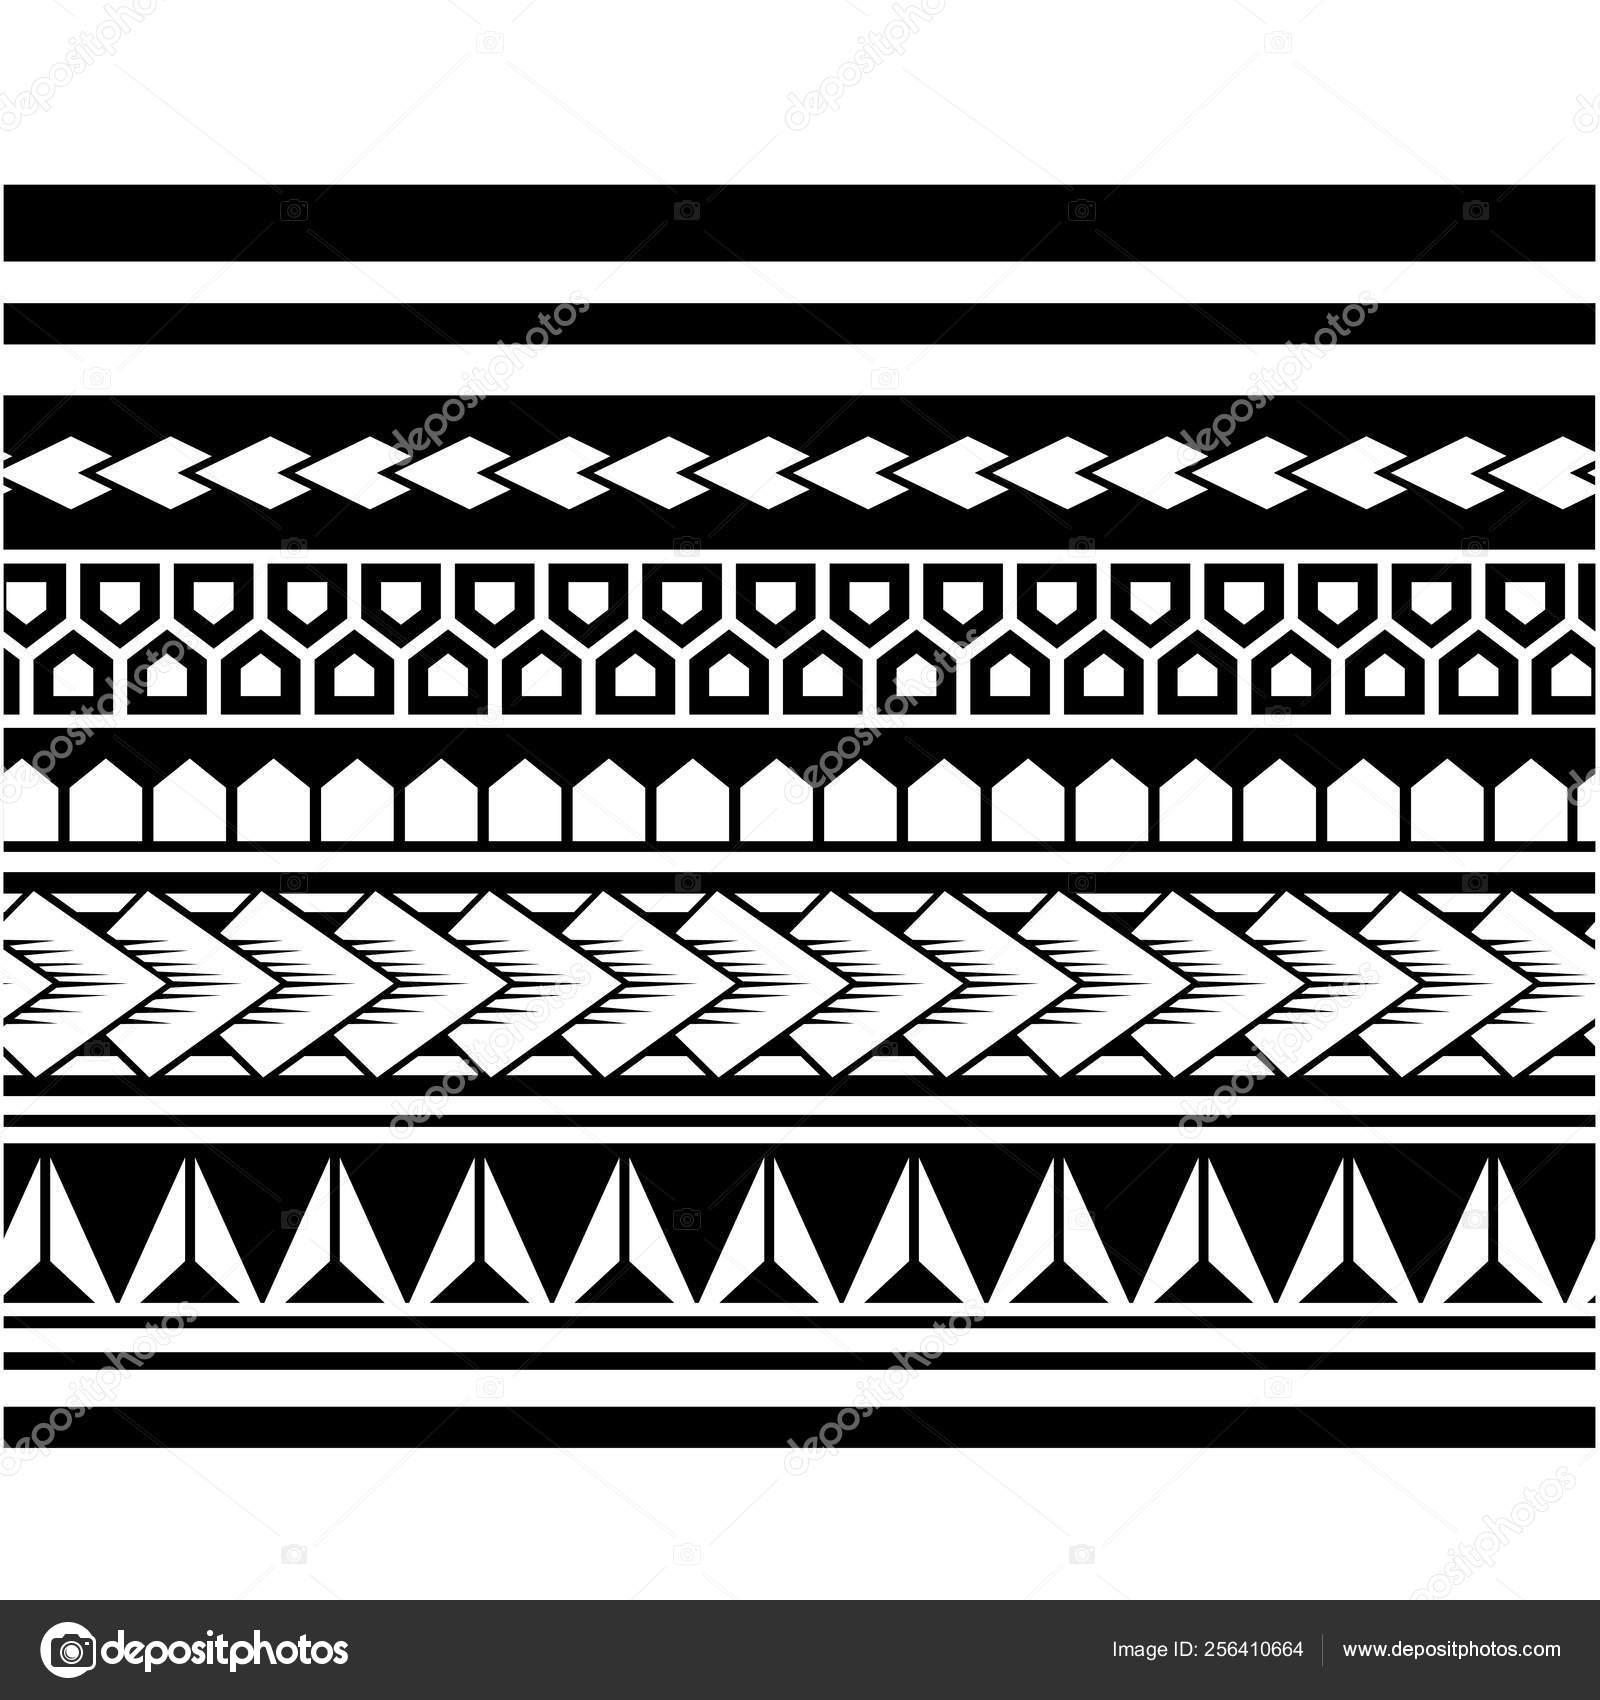 Vector Patrón Manga Tatuaje Polinesio Diseño Pies Antebrazo Samoano